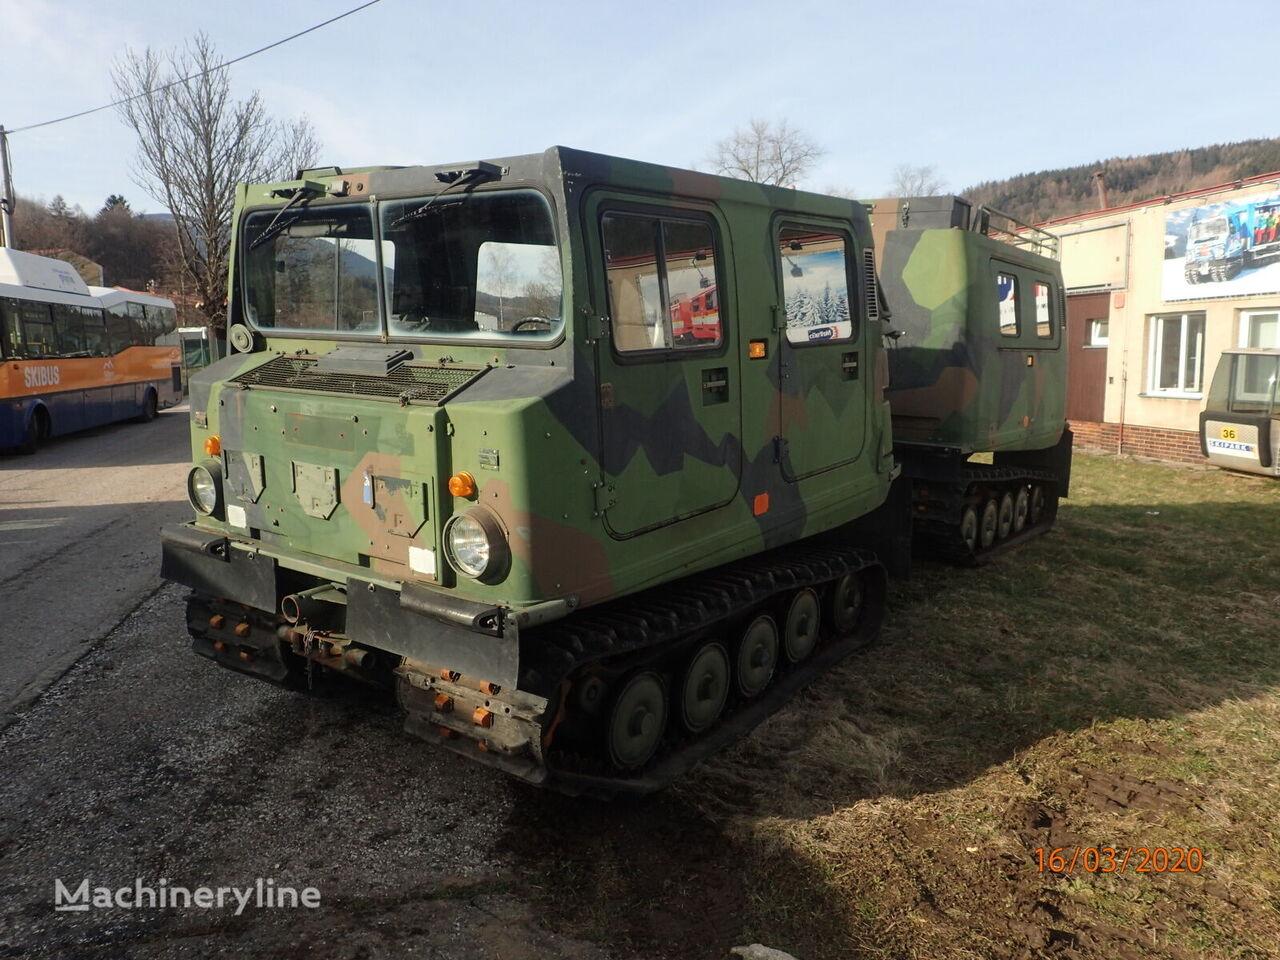 obojživelné terénne vozidlo Hagglunds BV206